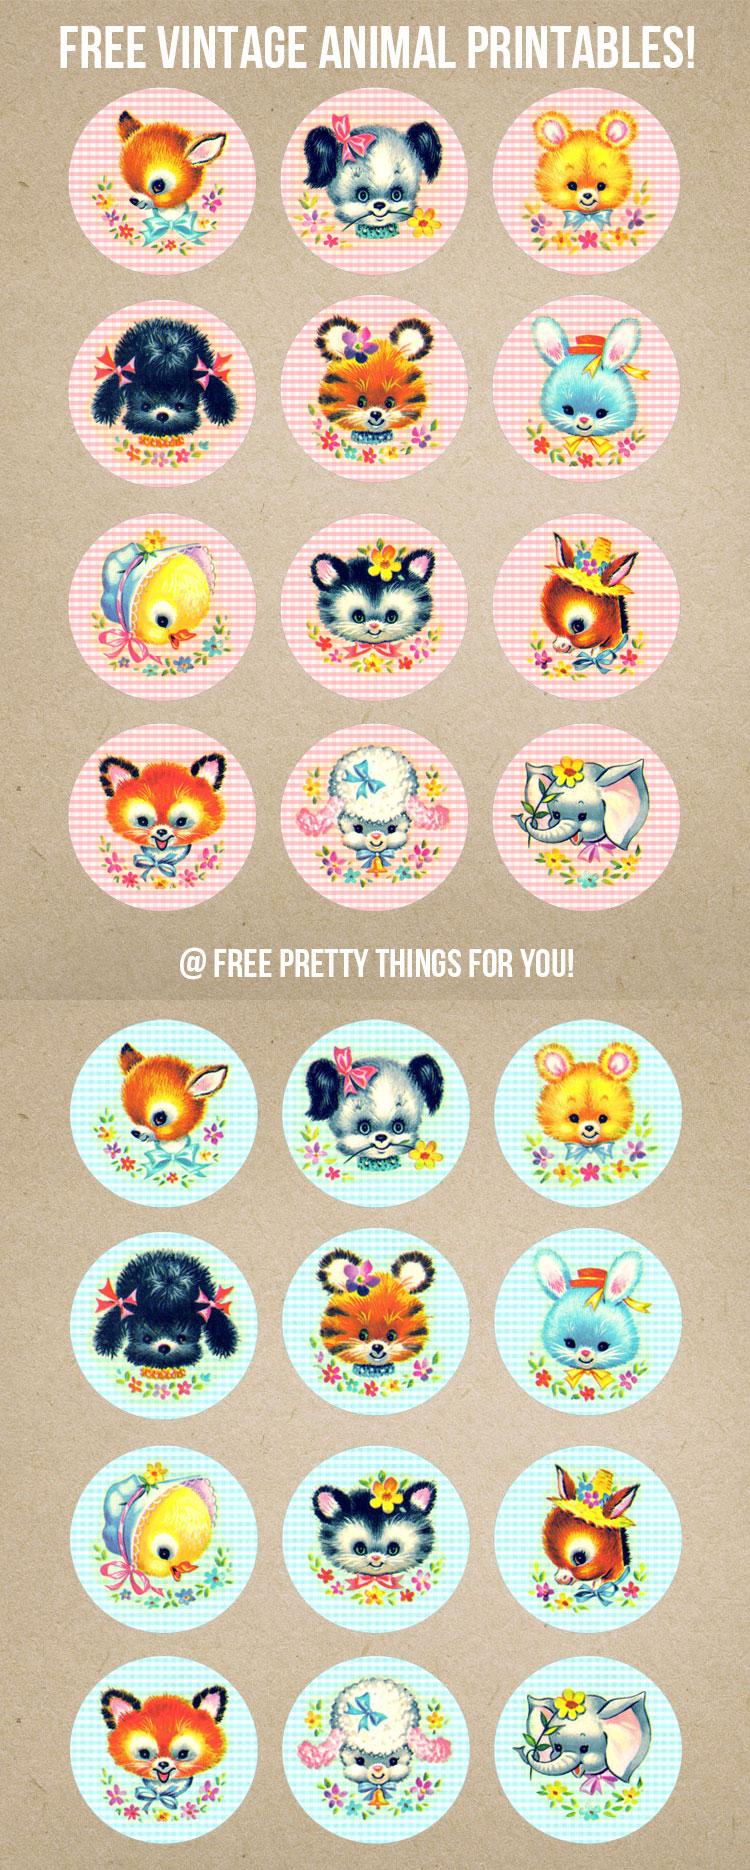 Vintage_Stock_Kitschy_Baby_Animal_Circles_FPTFY_7